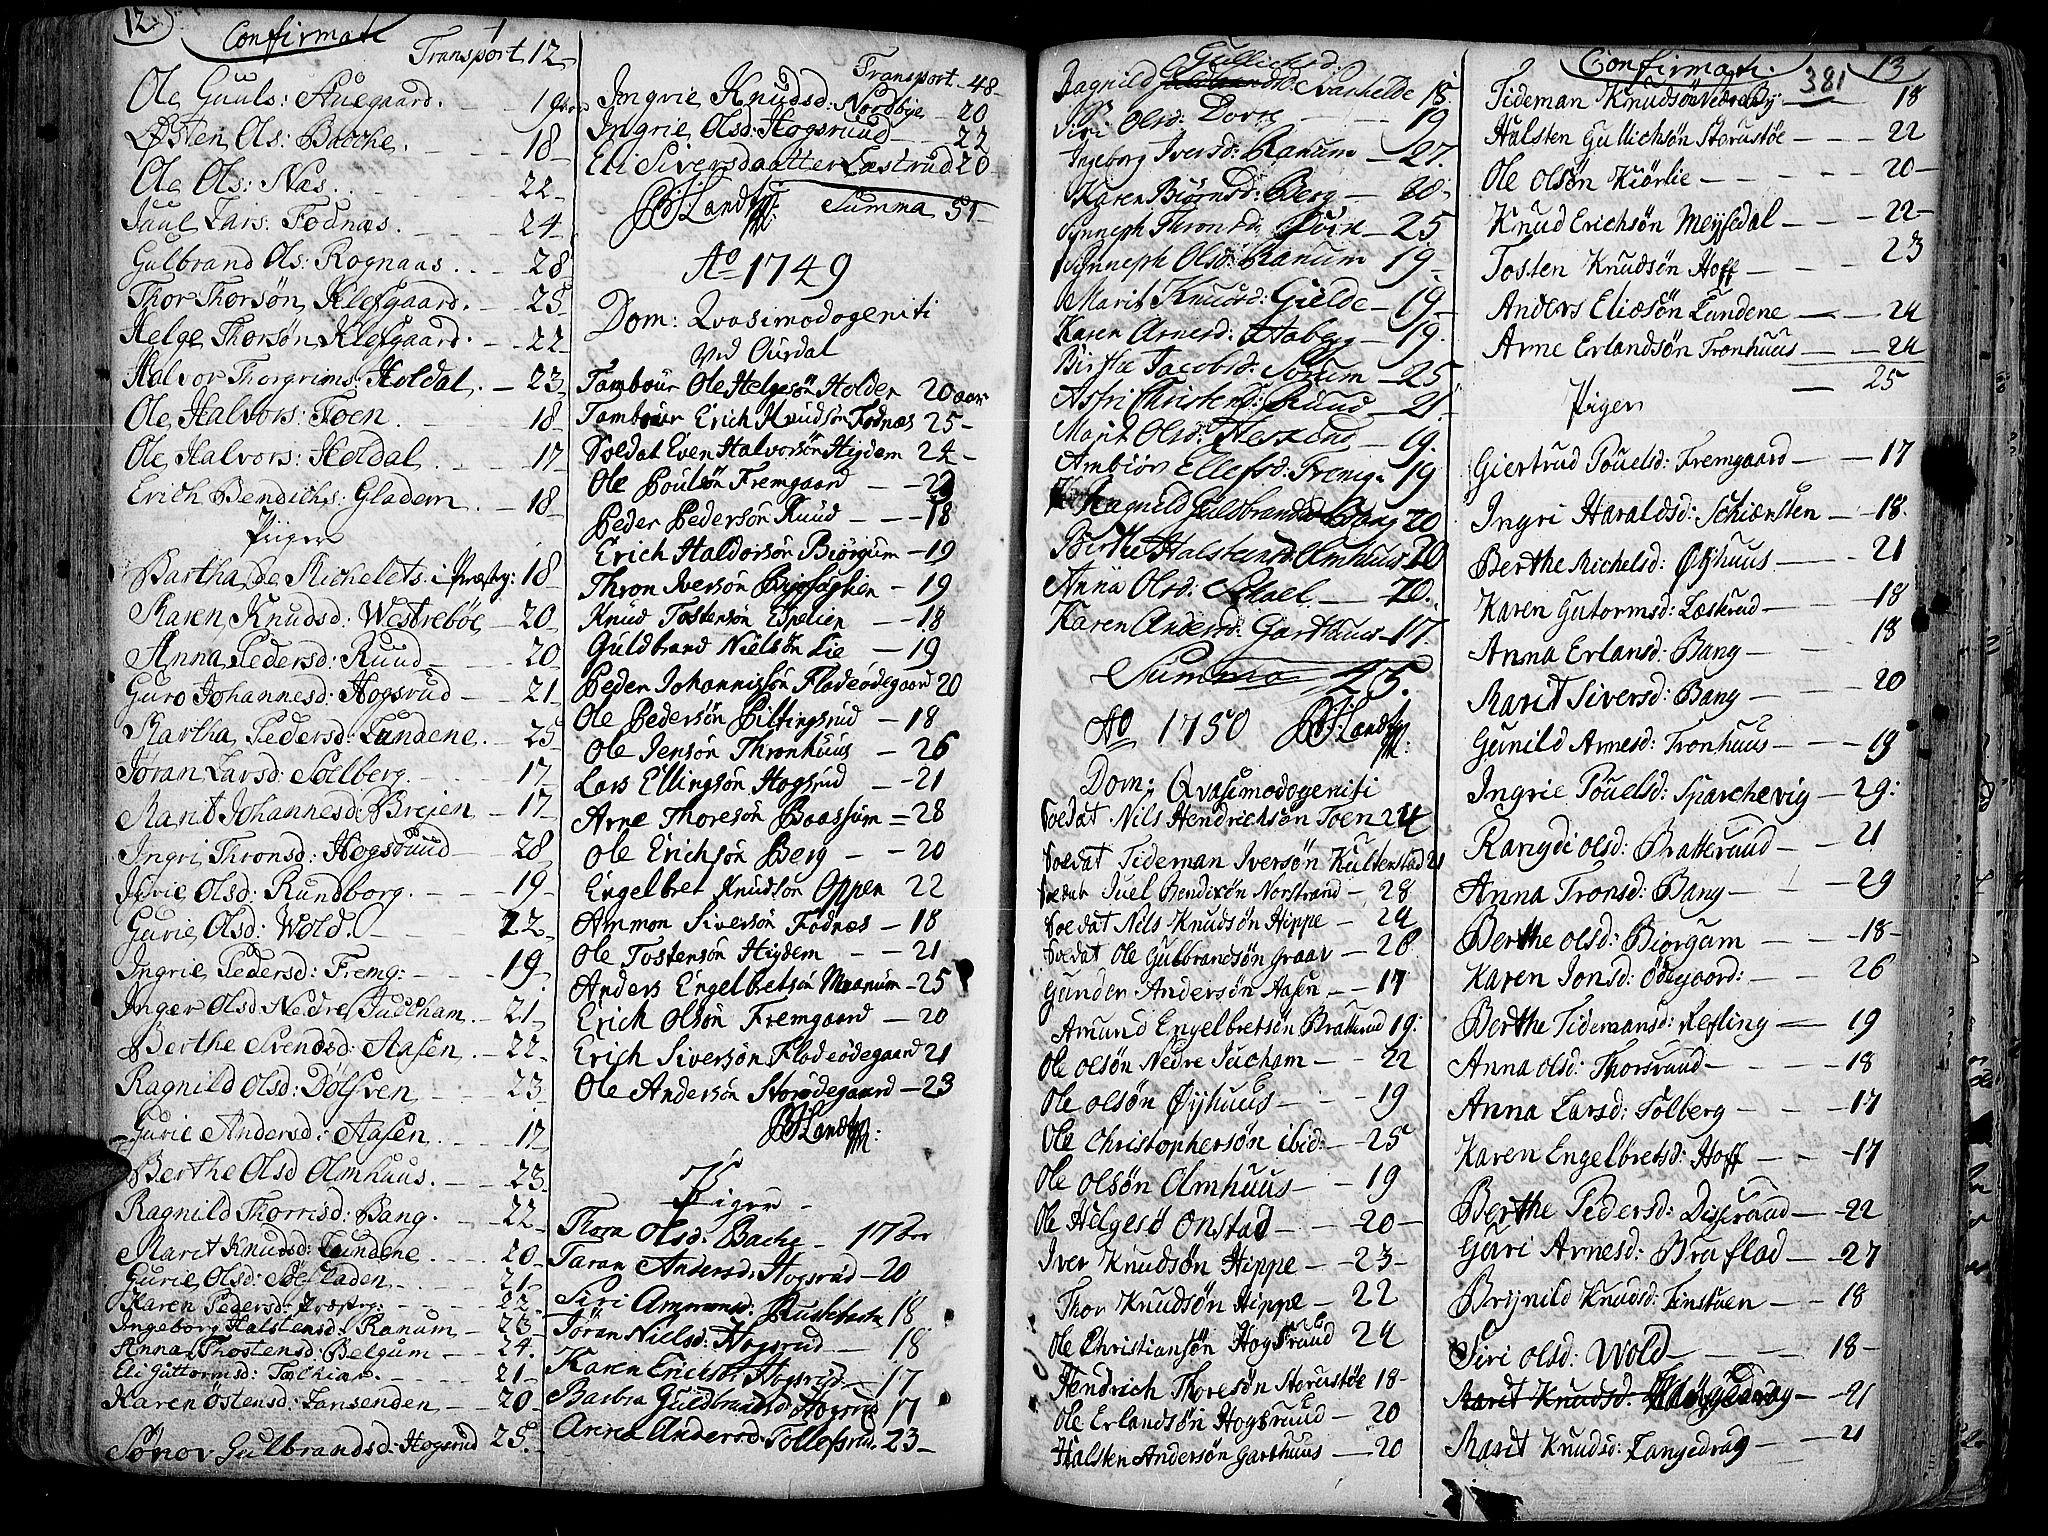 SAH, Aurdal prestekontor, Ministerialbok nr. 4, 1730-1762, s. 12-13